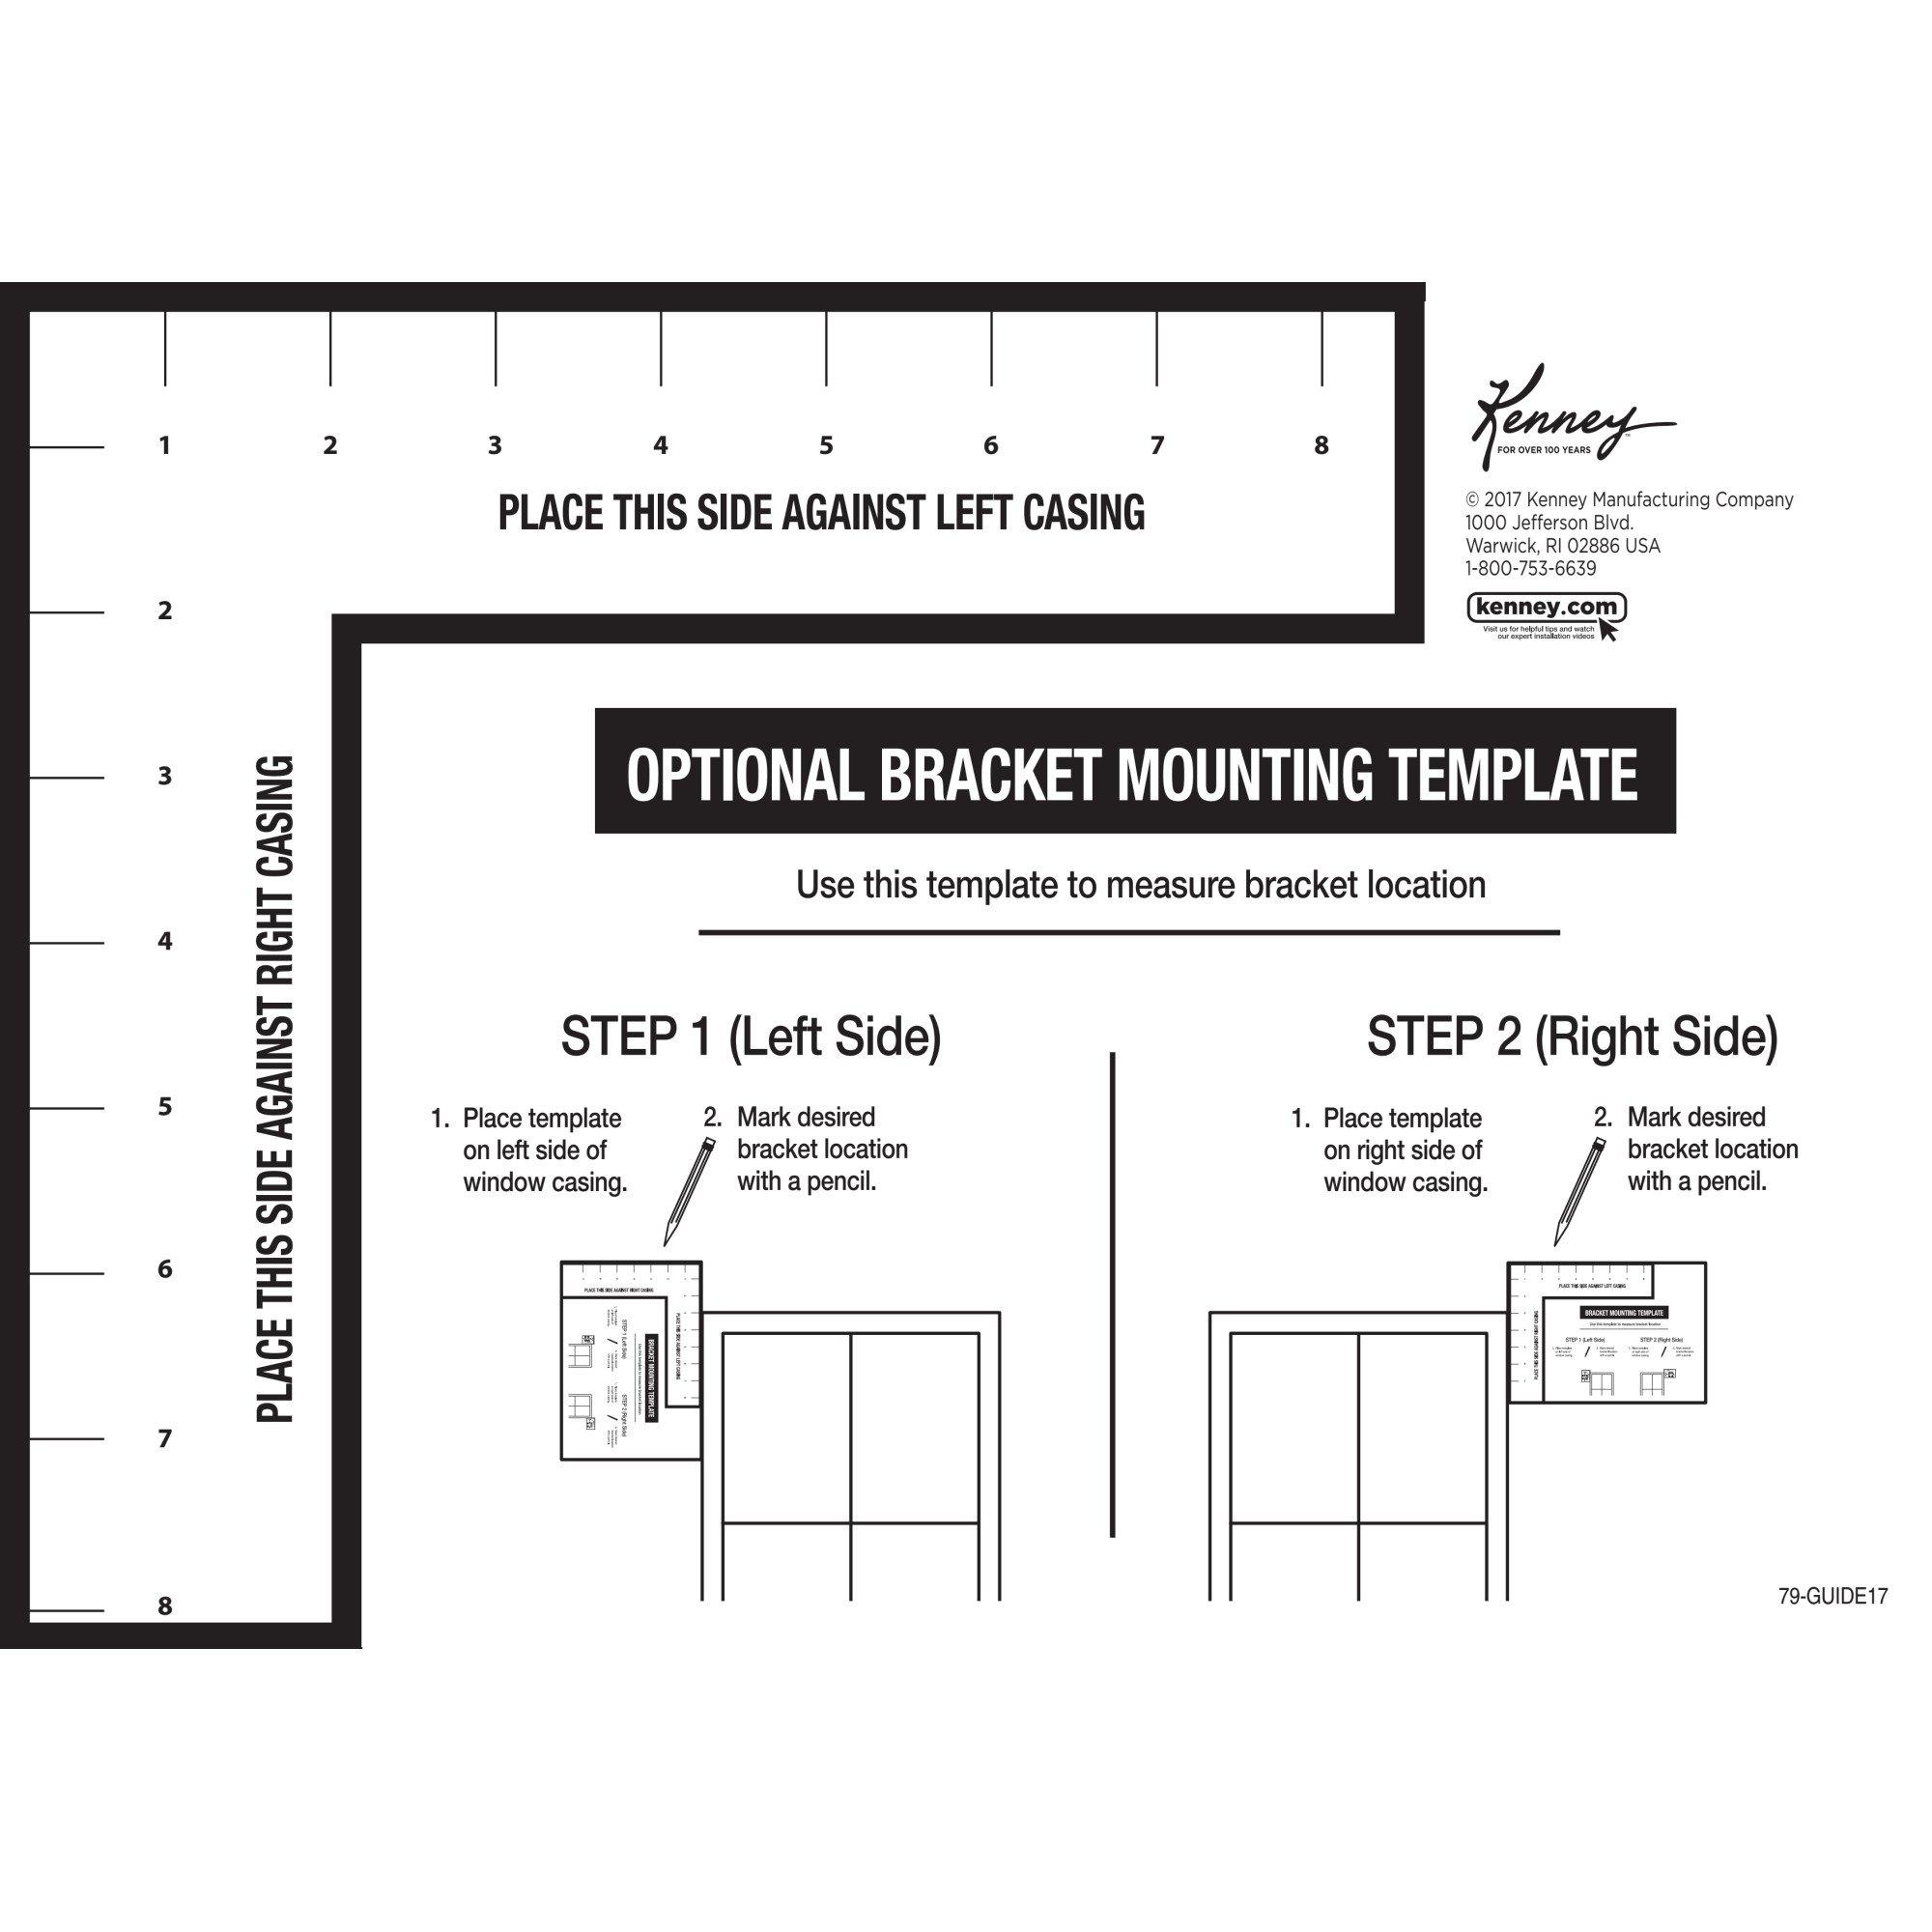 Kenney Glendale Standard Decorative Window Curtain Rod, 48-86'', Black by Kenney (Image #3)